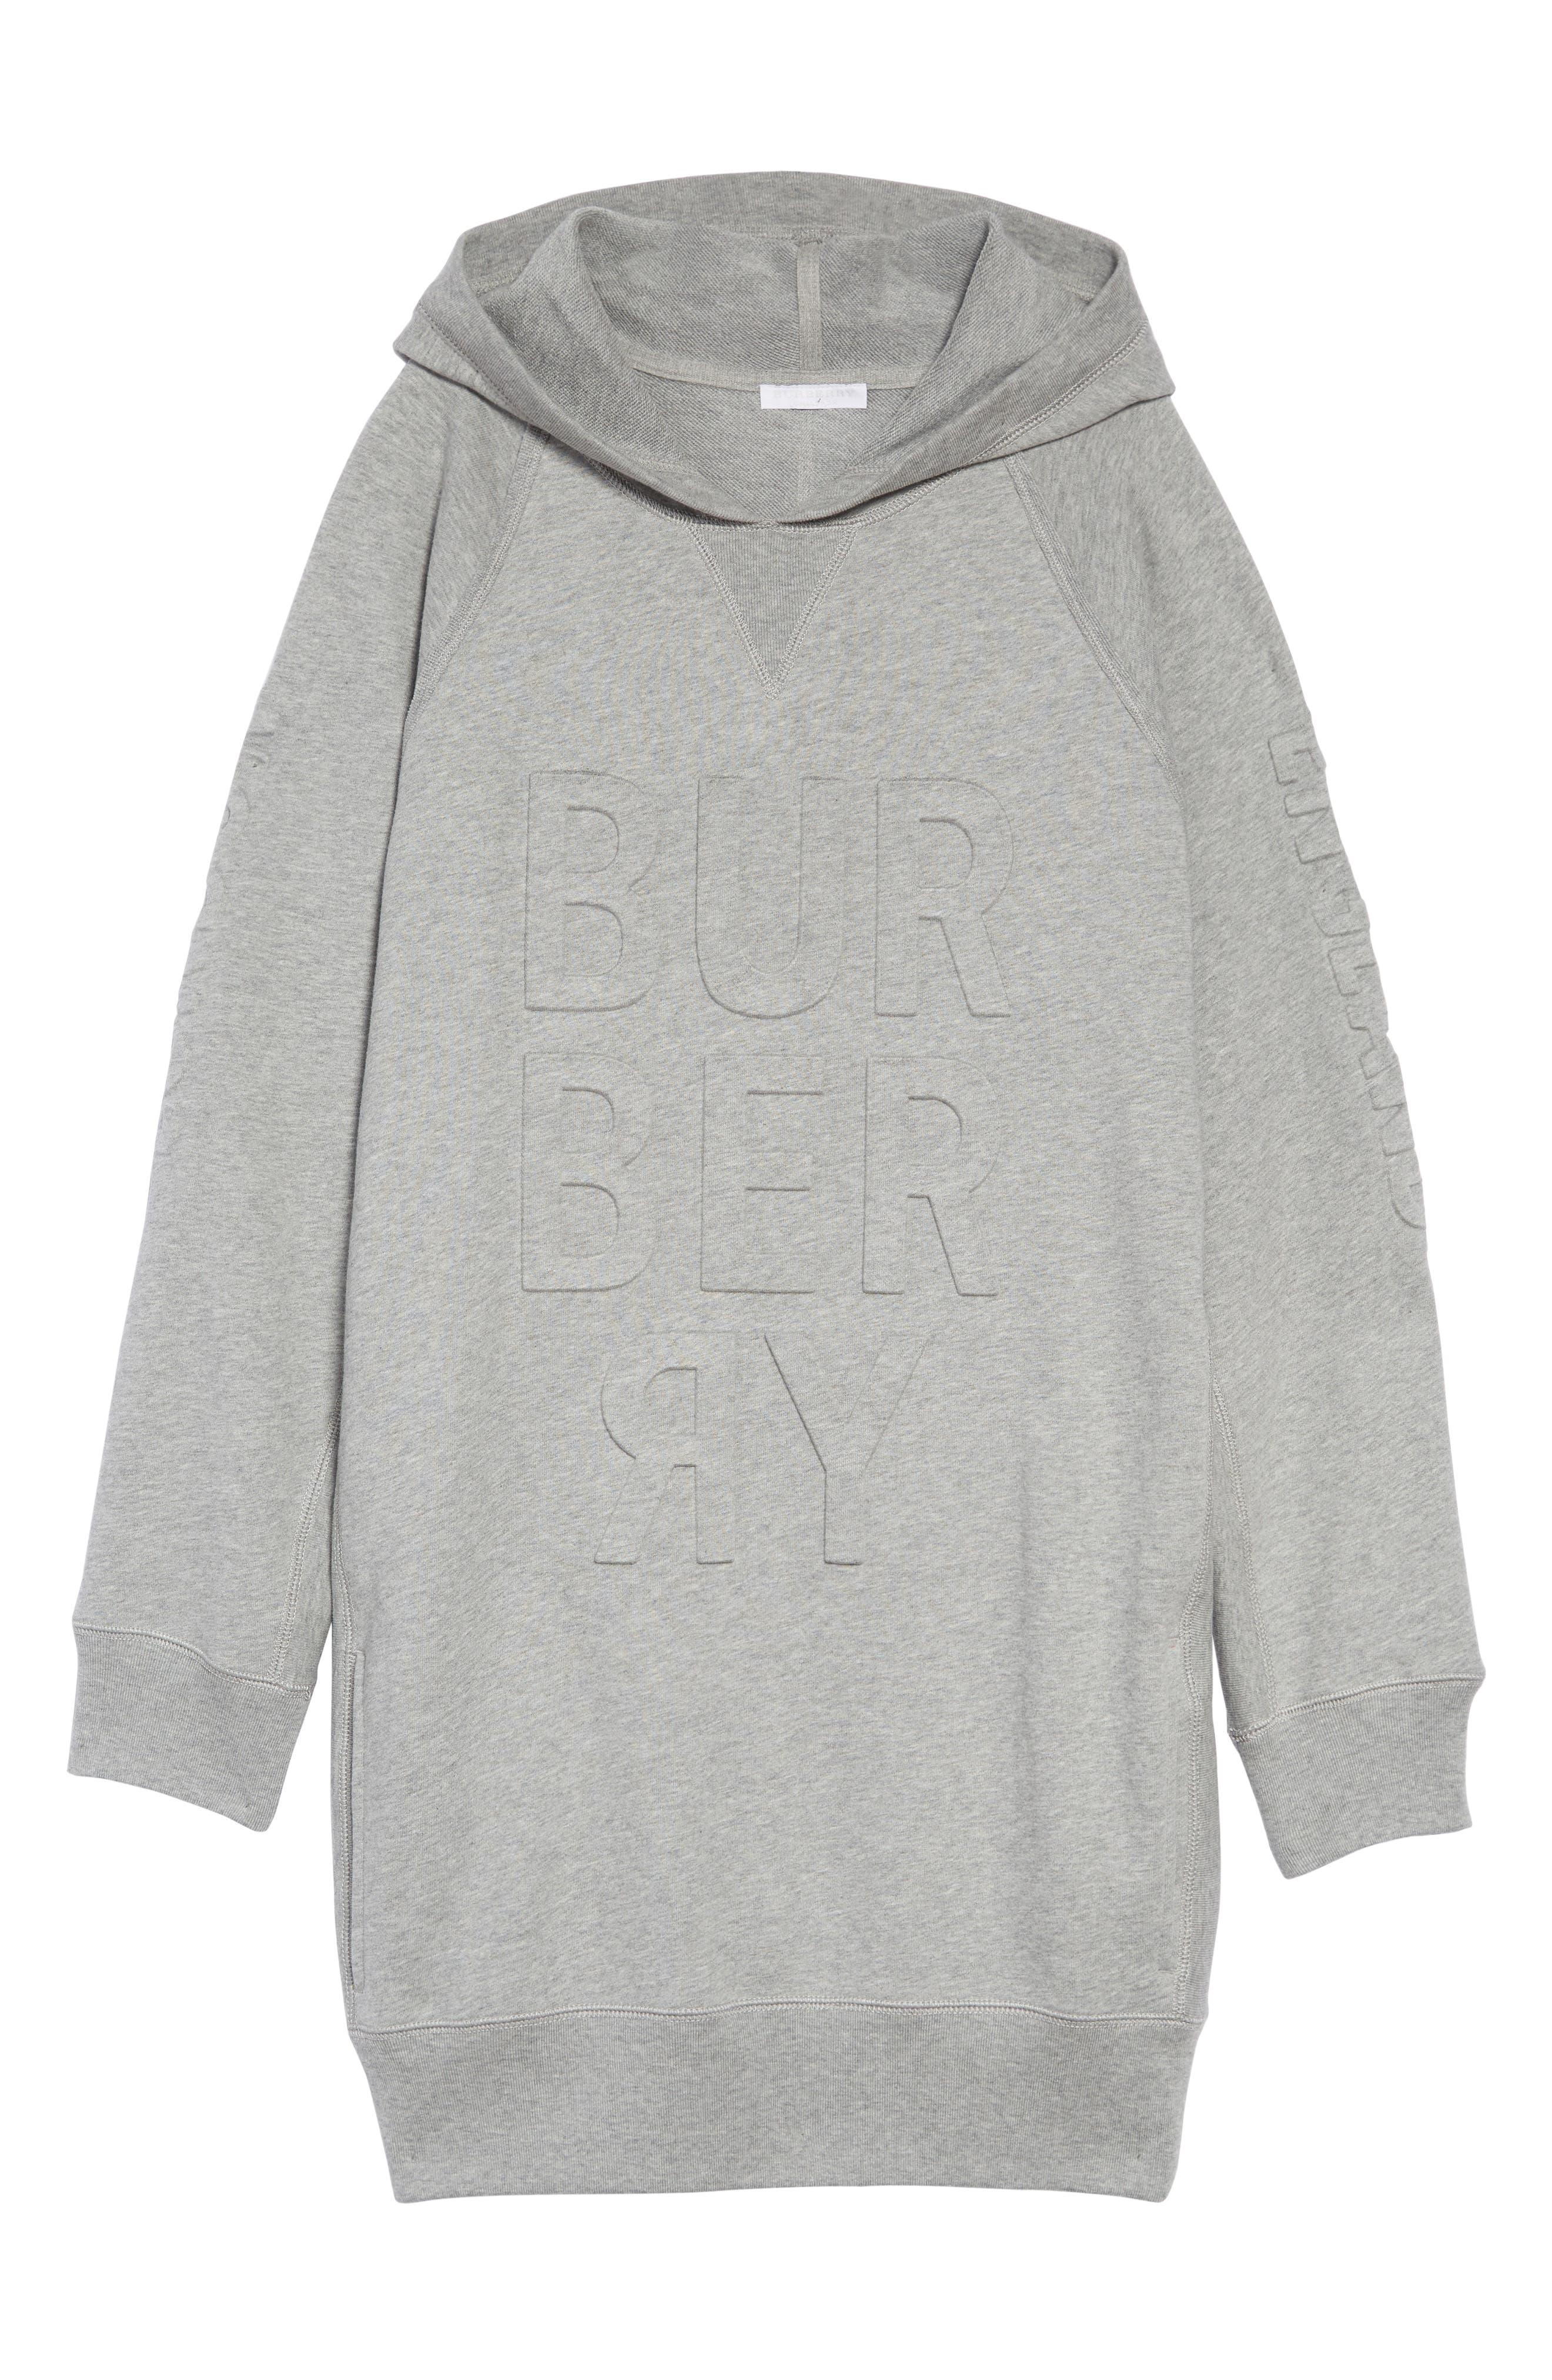 BURBERRY, Aurora Logo Sweatshirt Dress, Main thumbnail 1, color, GREY MELANGE